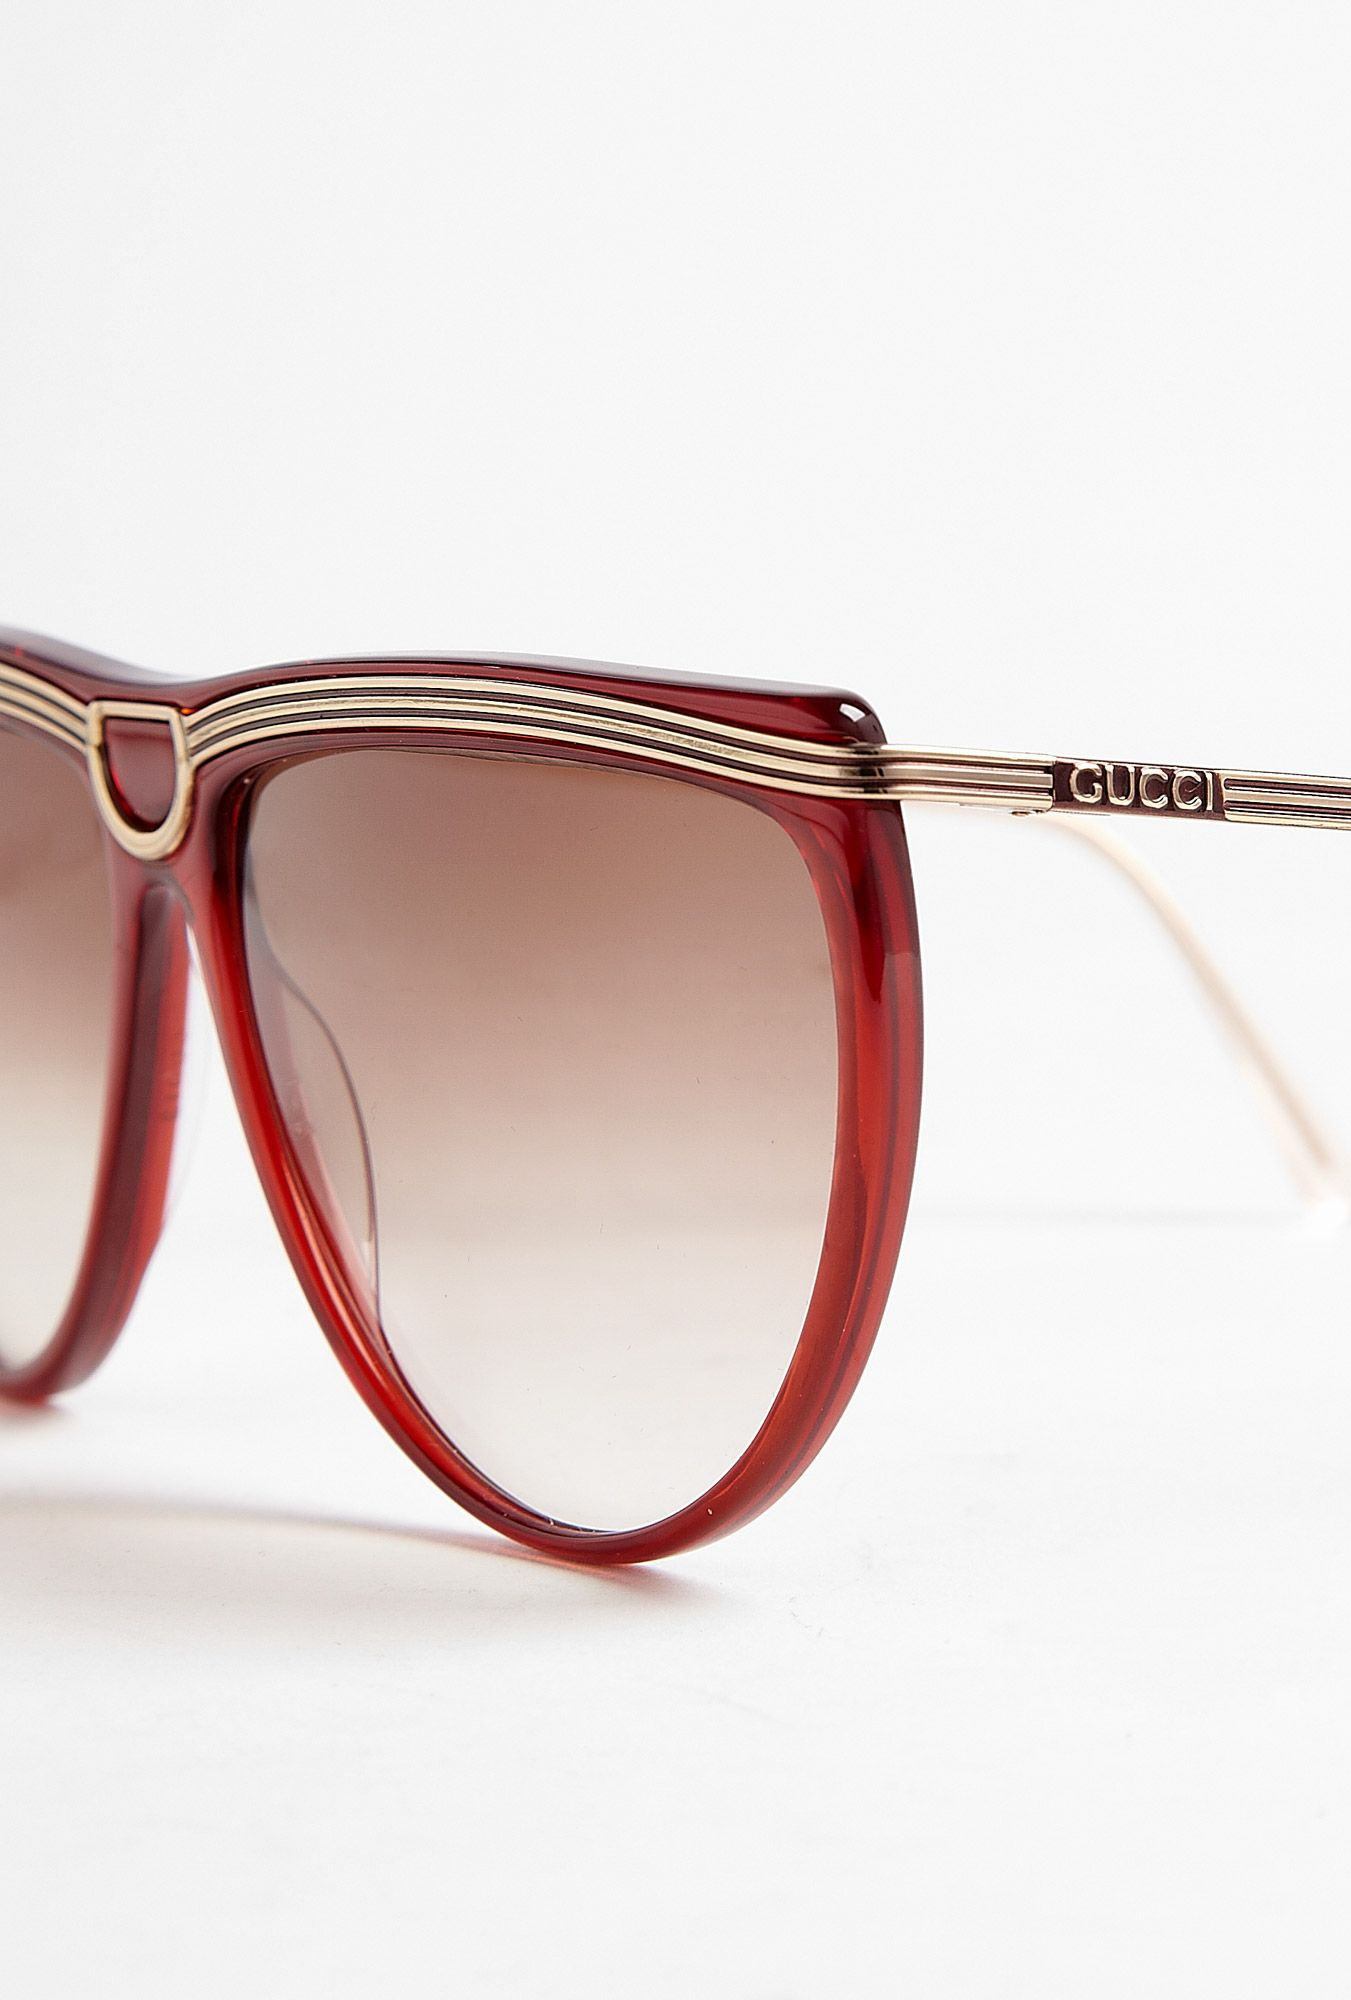 089d41d6c2a Red   Gold Frame Vintage Gucci Sunglasses by Retrosun